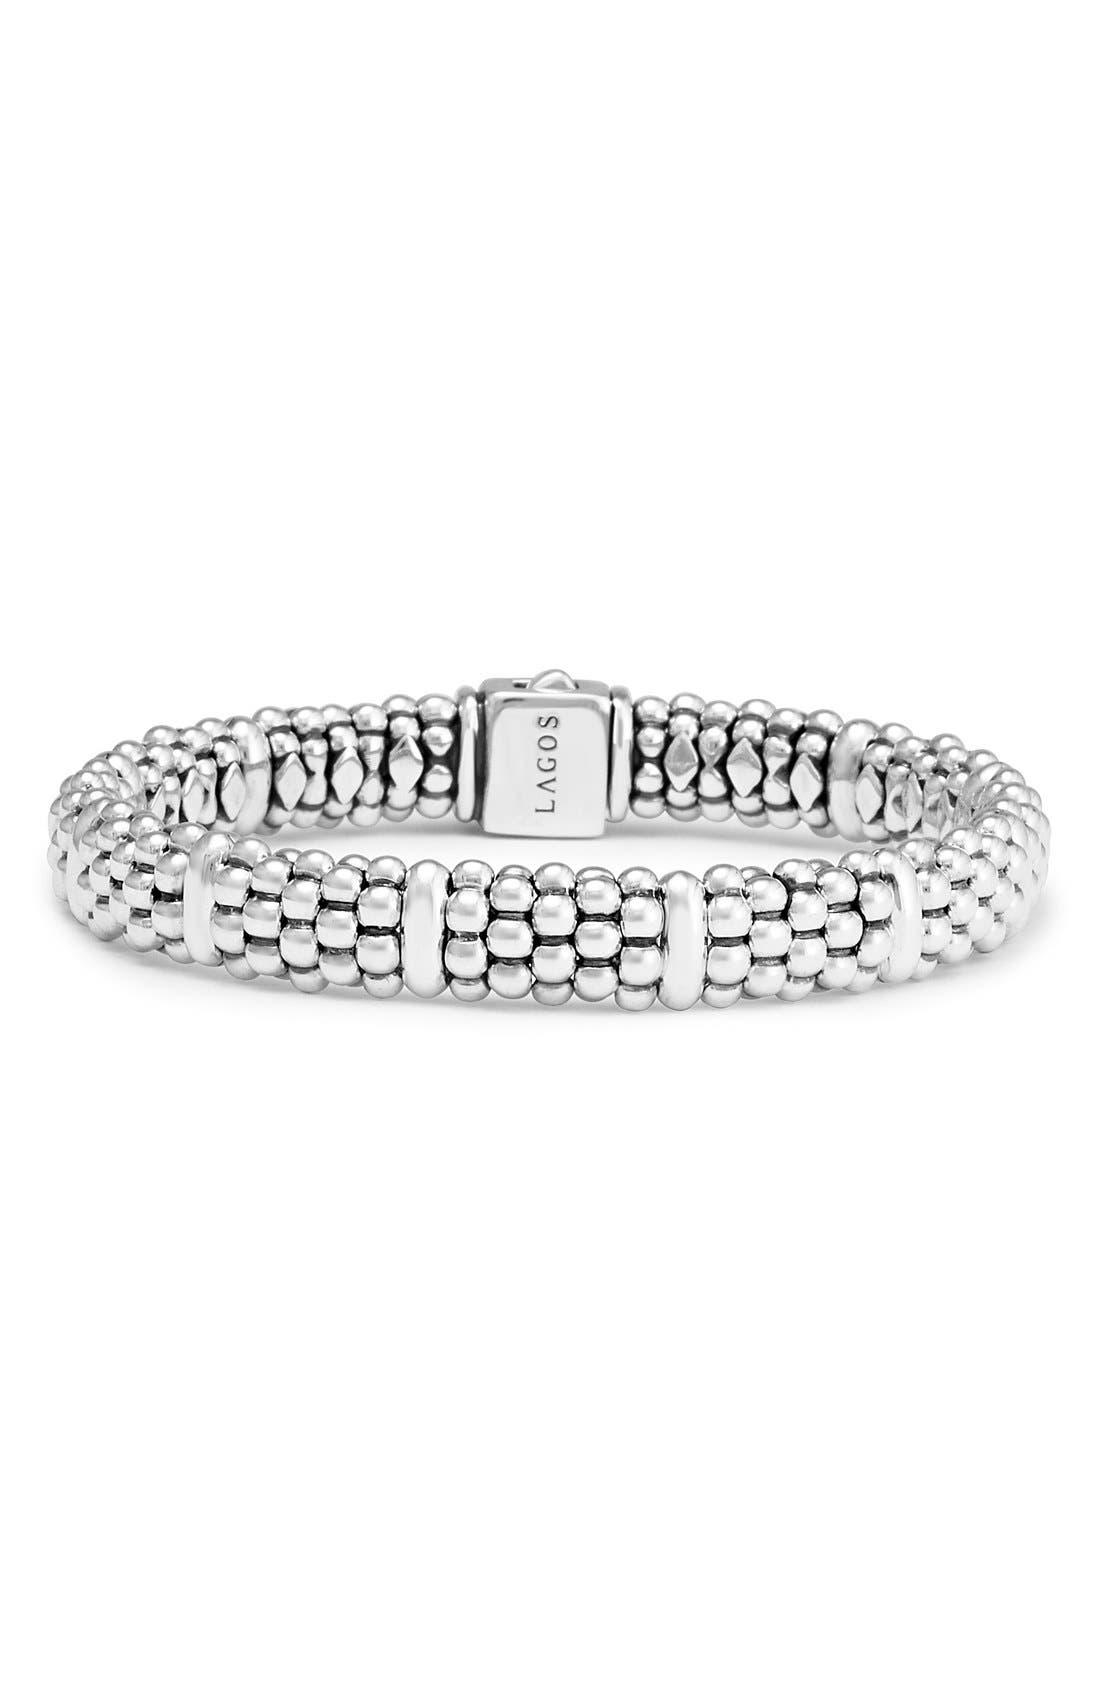 Oval Rope Caviar Bracelet,                             Main thumbnail 1, color,                             SILVER